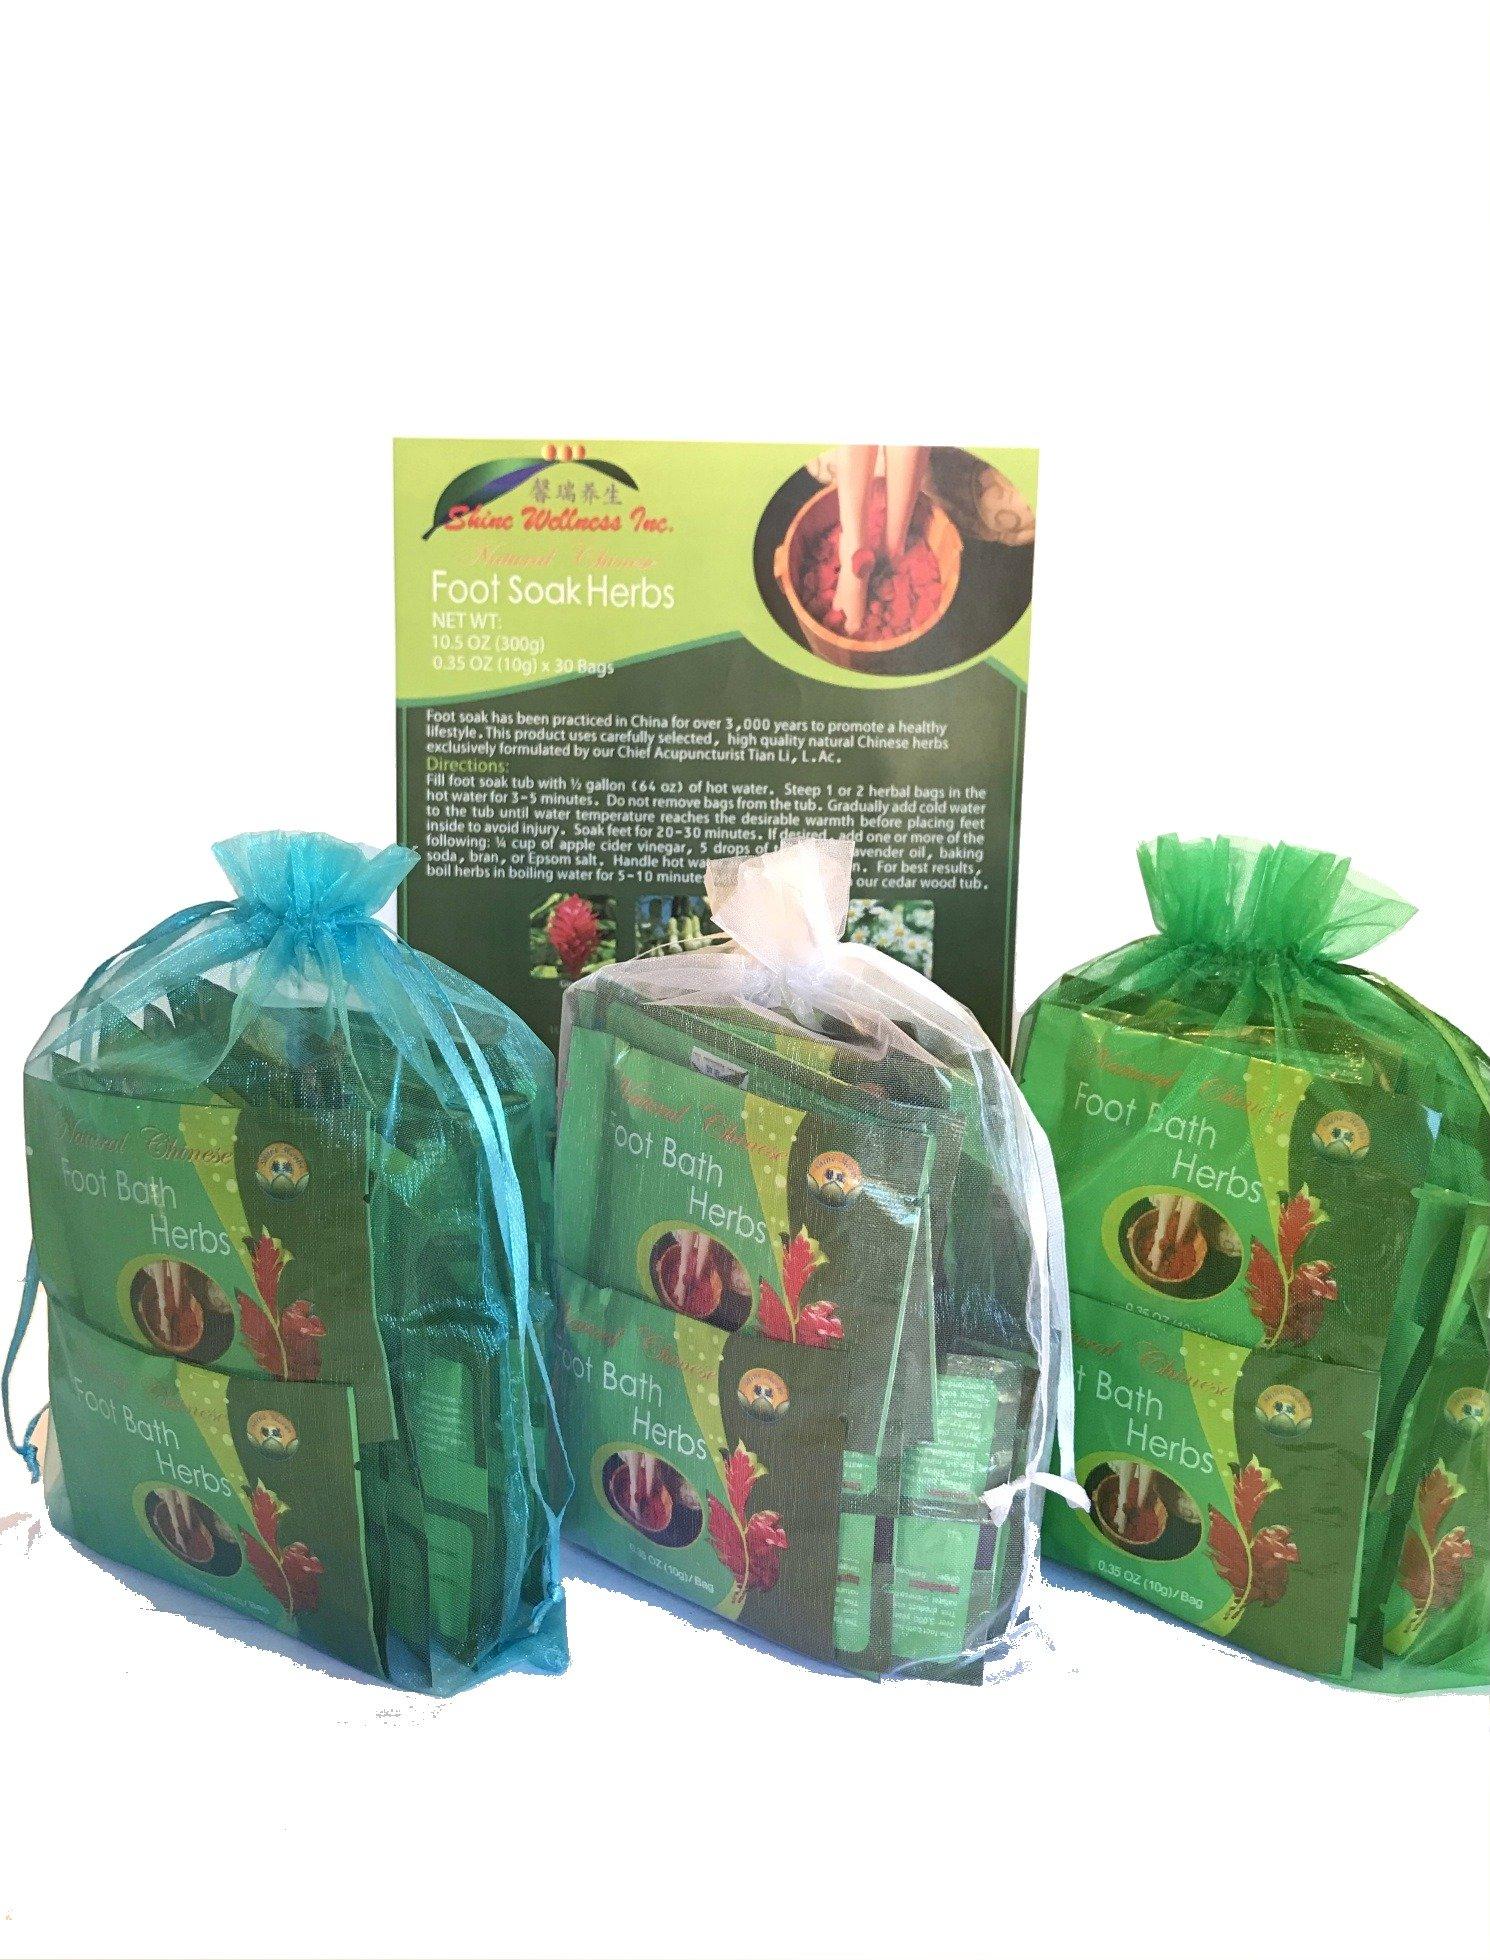 TCM Head-to-Toe Pack- 3 Boxes Foot Soak Herbs Plus 2 Free Bags Mugwort & Bath Herbs Samples $8 Value by Shine Wellness Inc